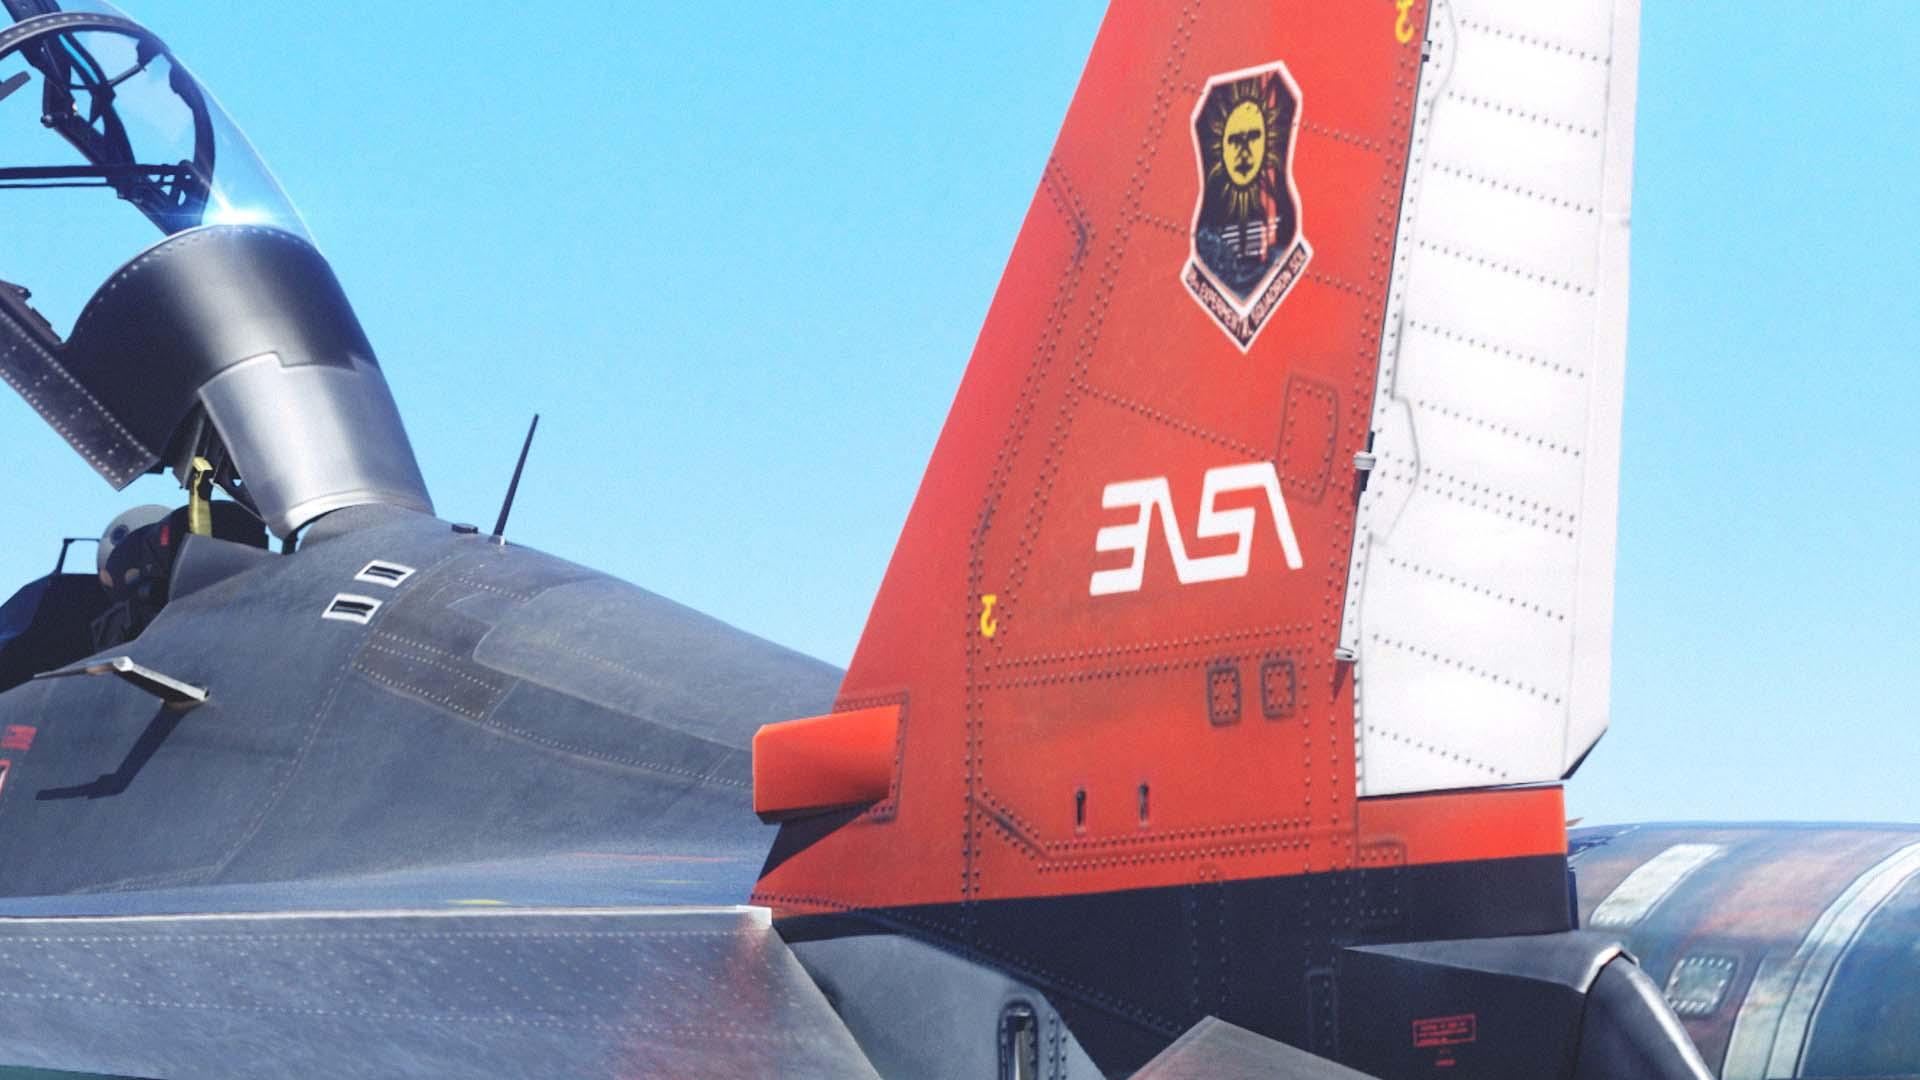 ace-combat-7-08-22-17-11.jpg